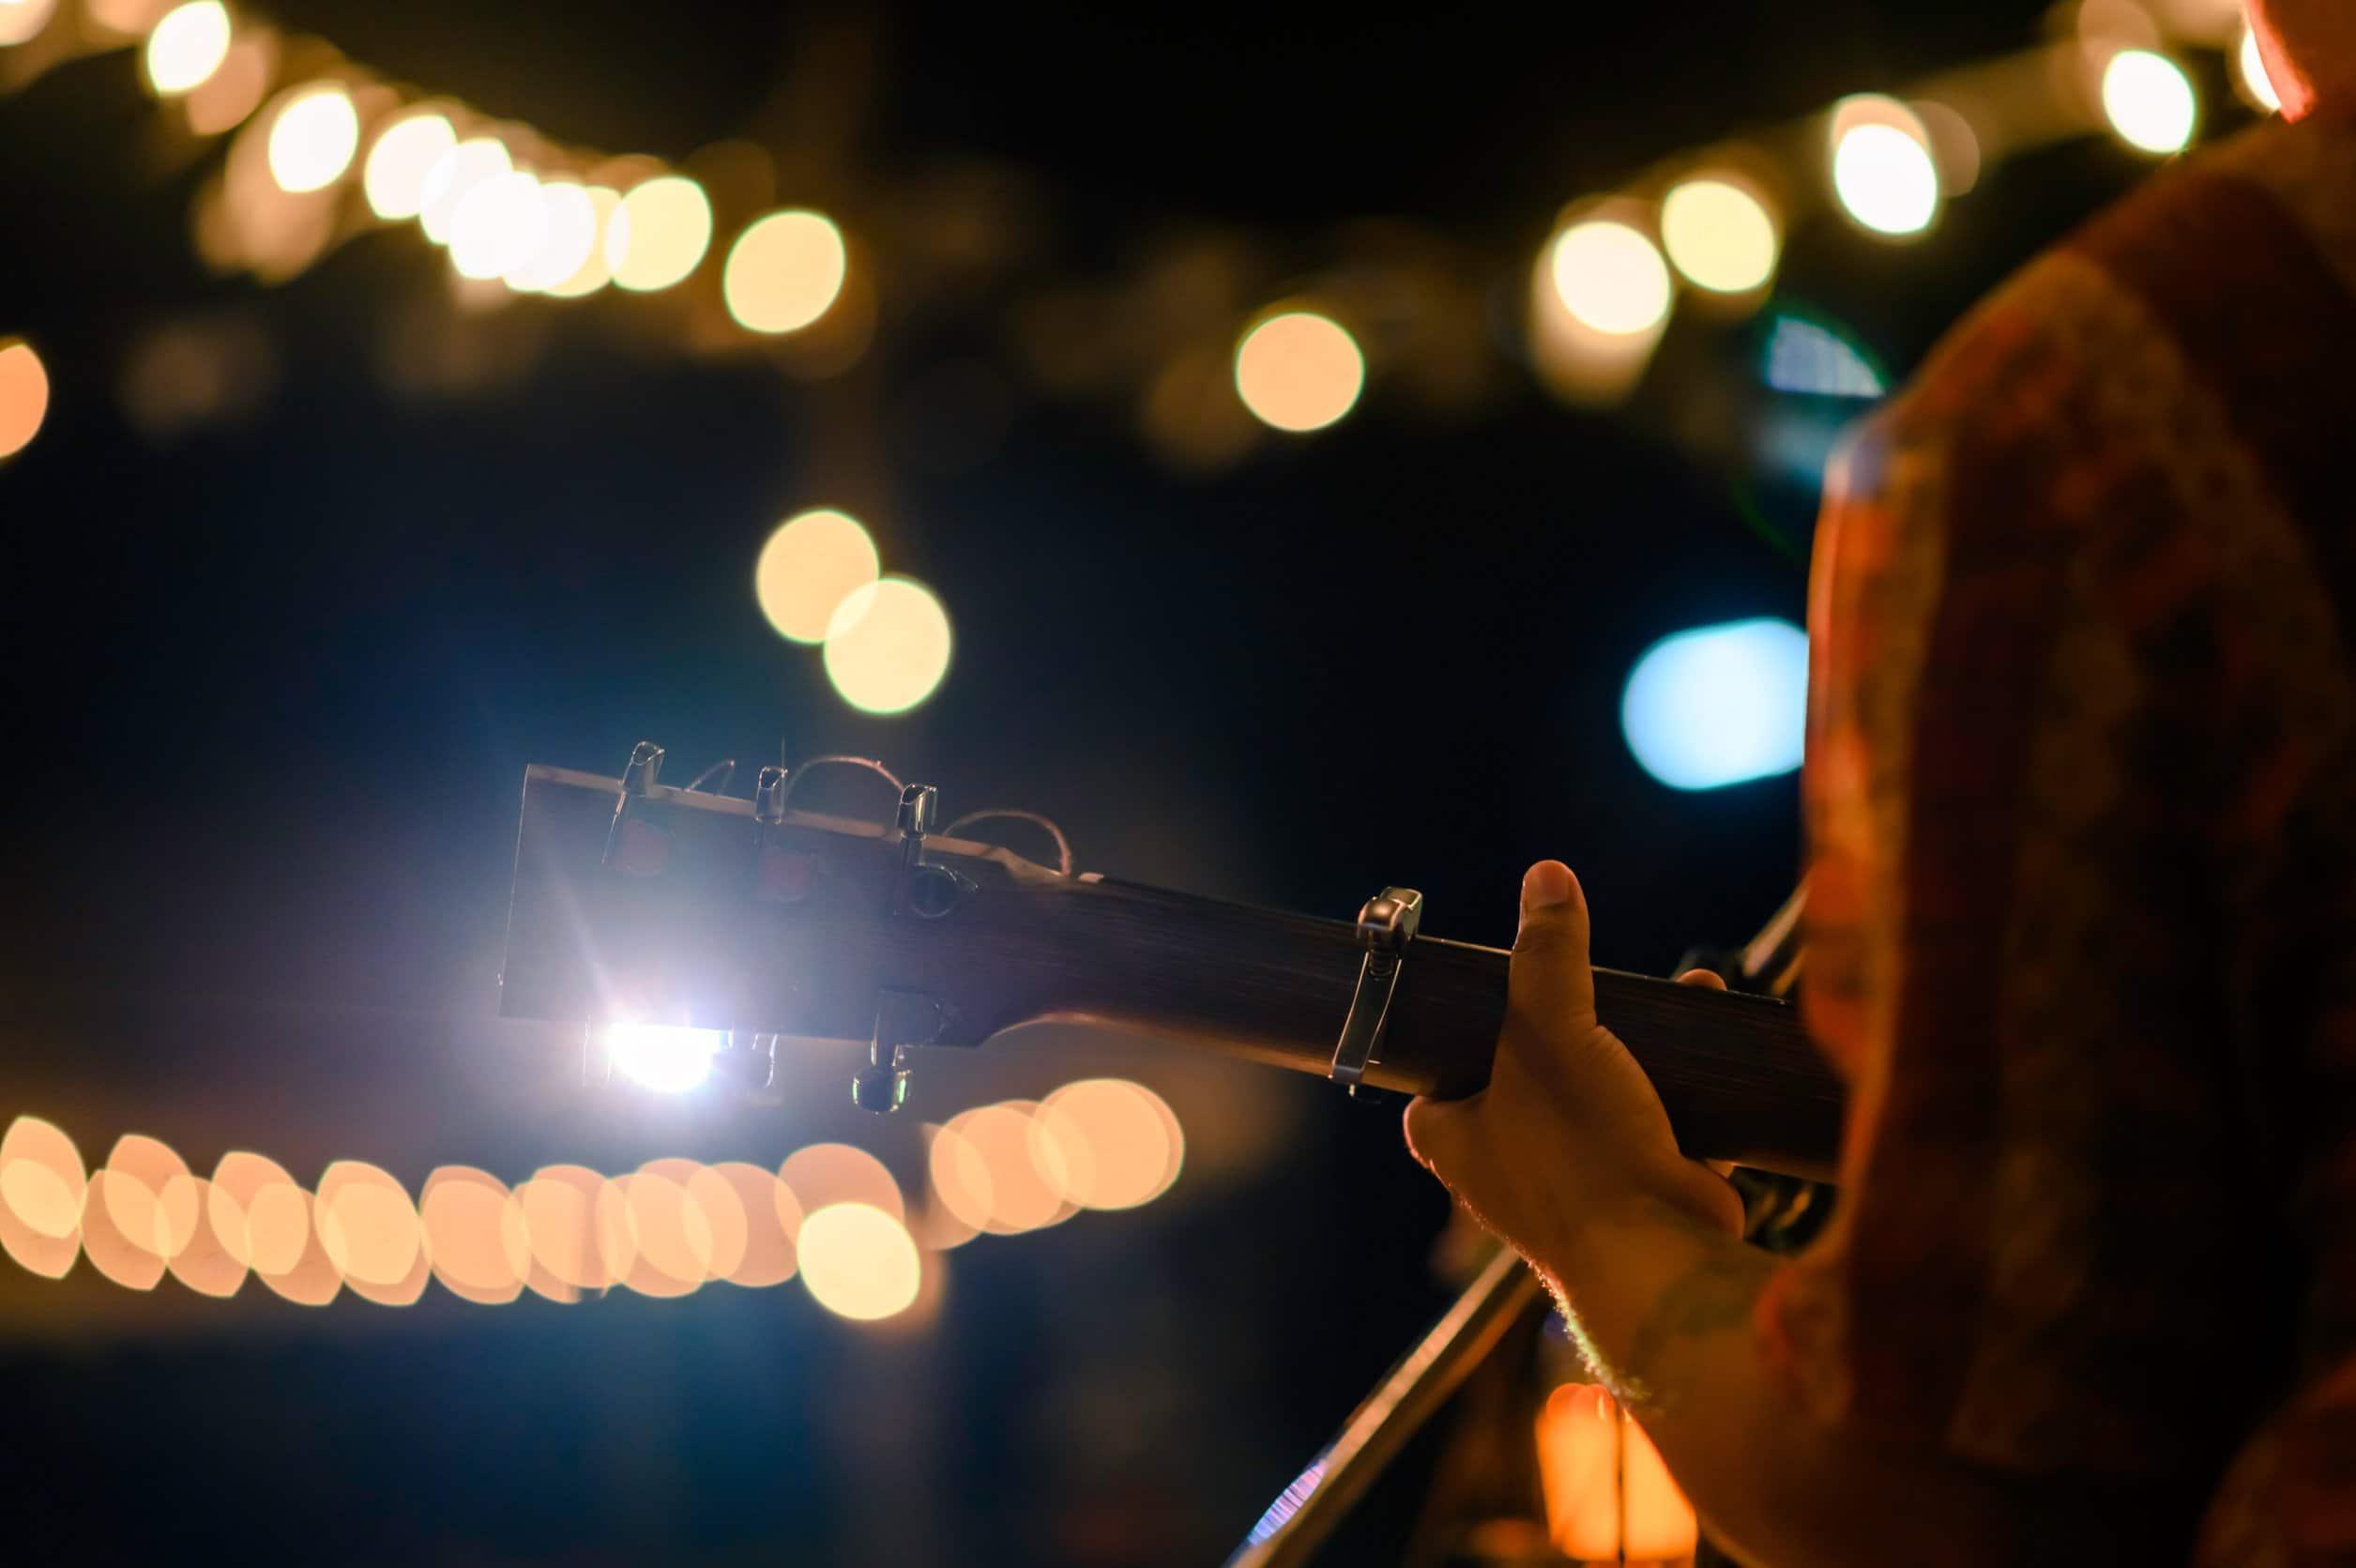 Country Singer on Stage - Gulf Coast Jam Panama City Beach Florida